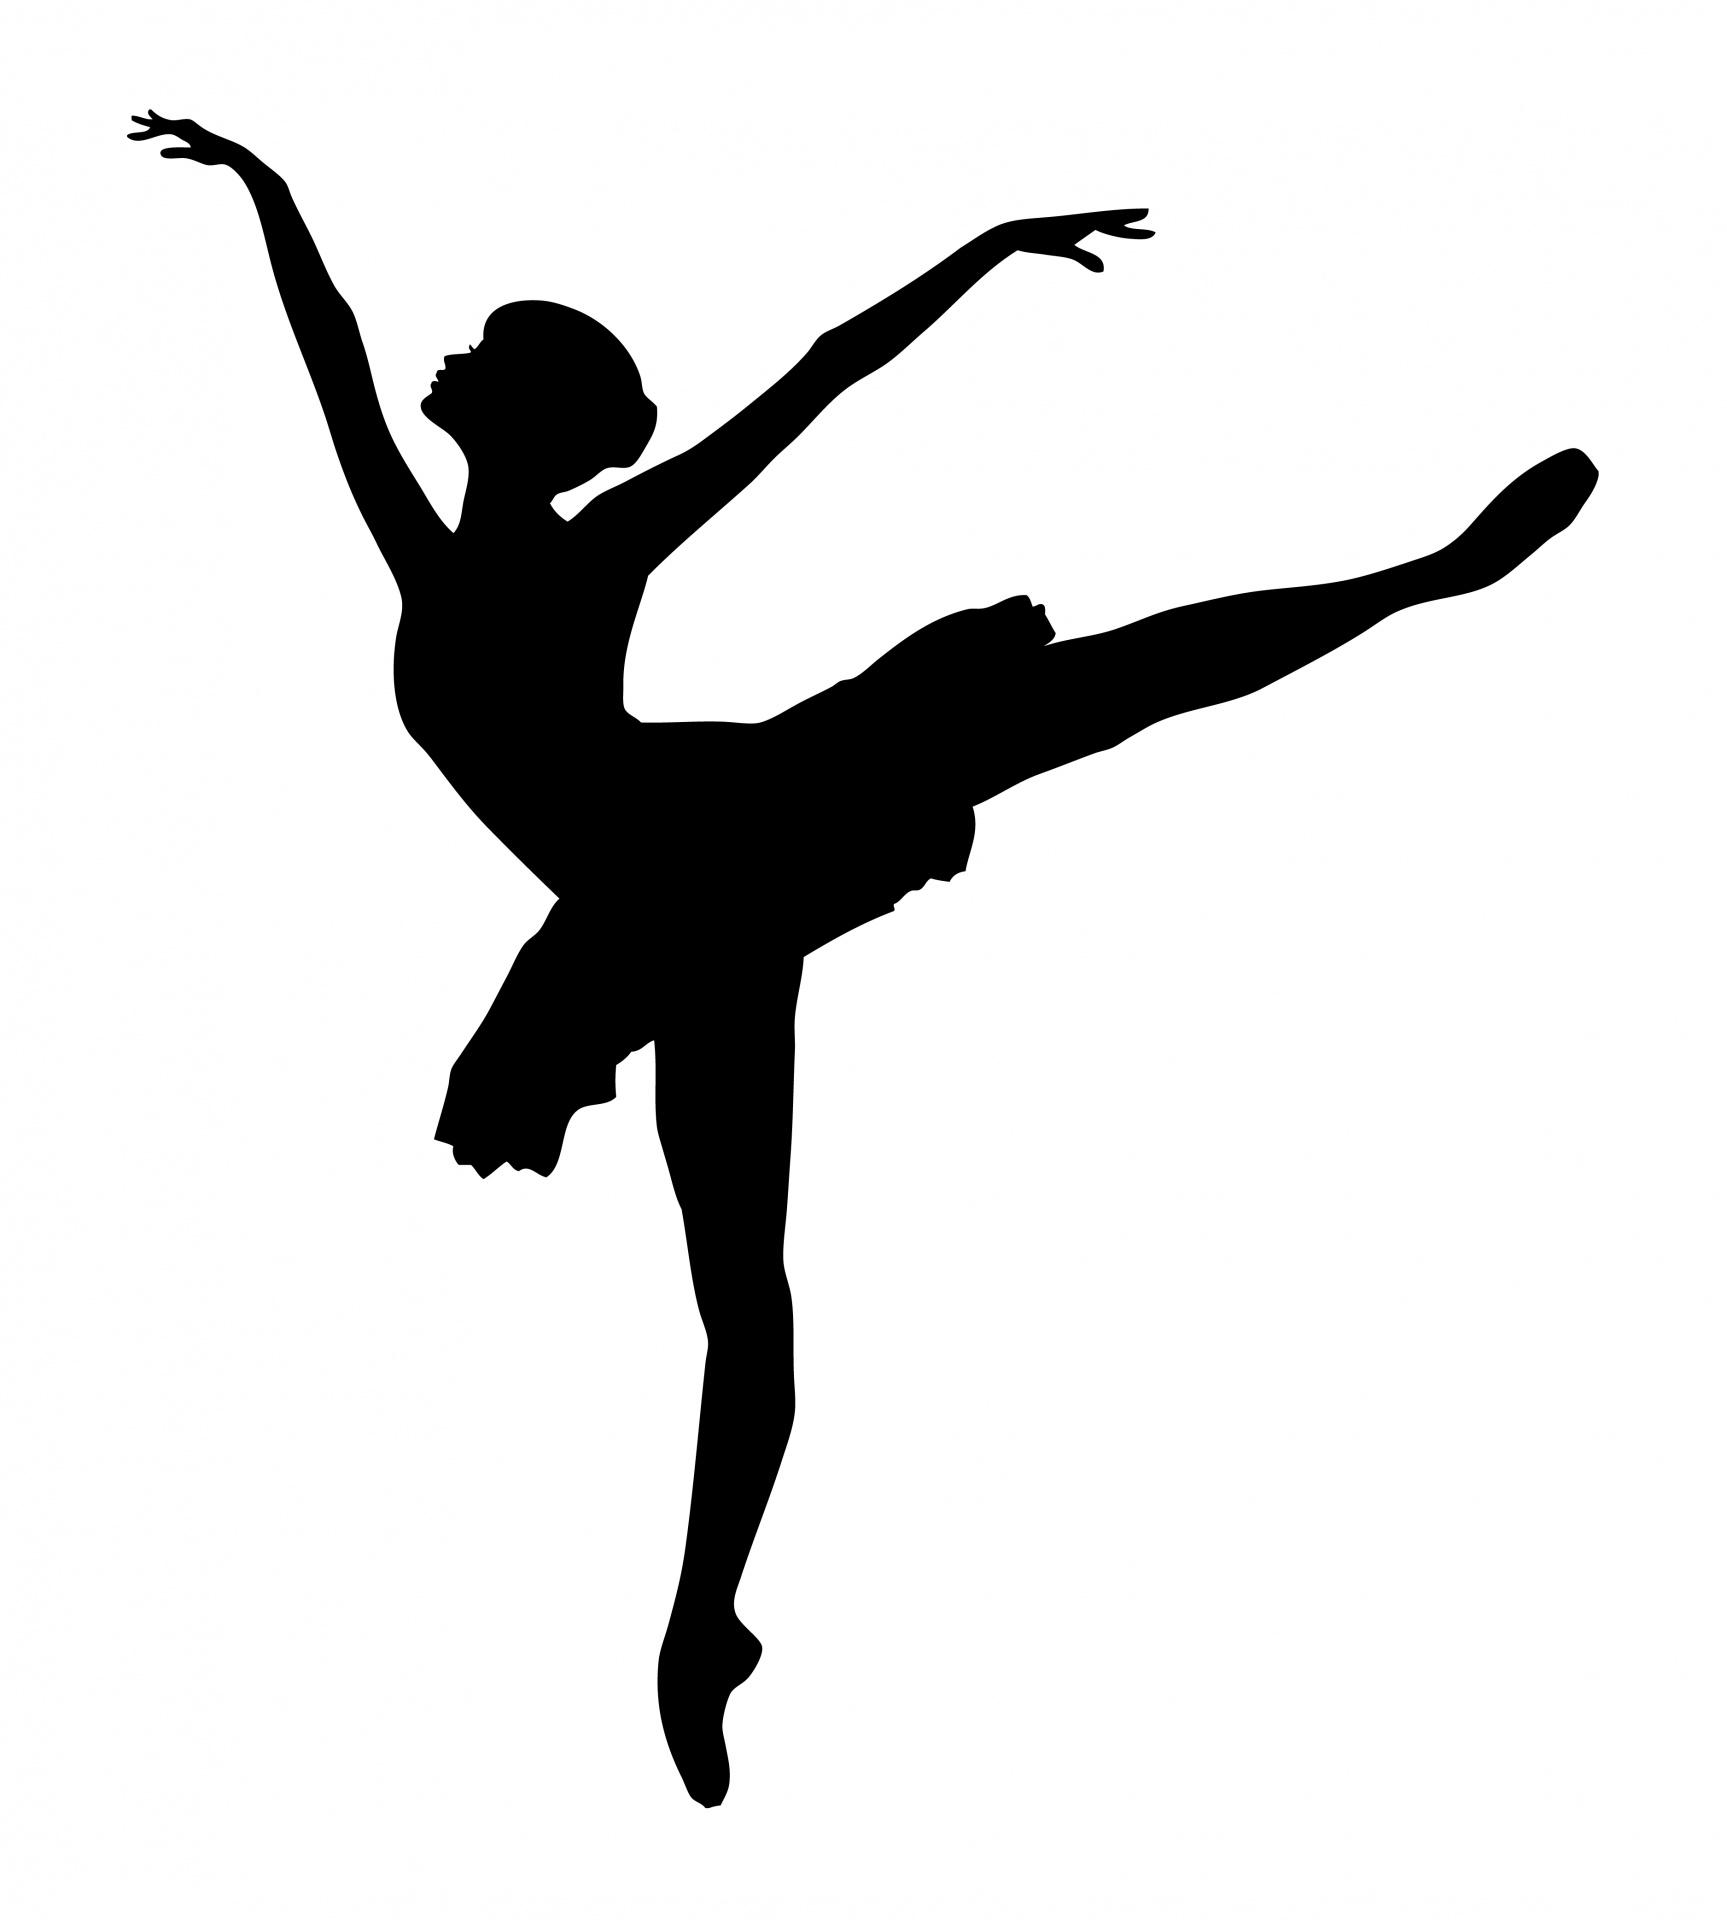 ffb927627b126 Ballet,dancer,ballet dancer,ballerina,black - free photo from ...